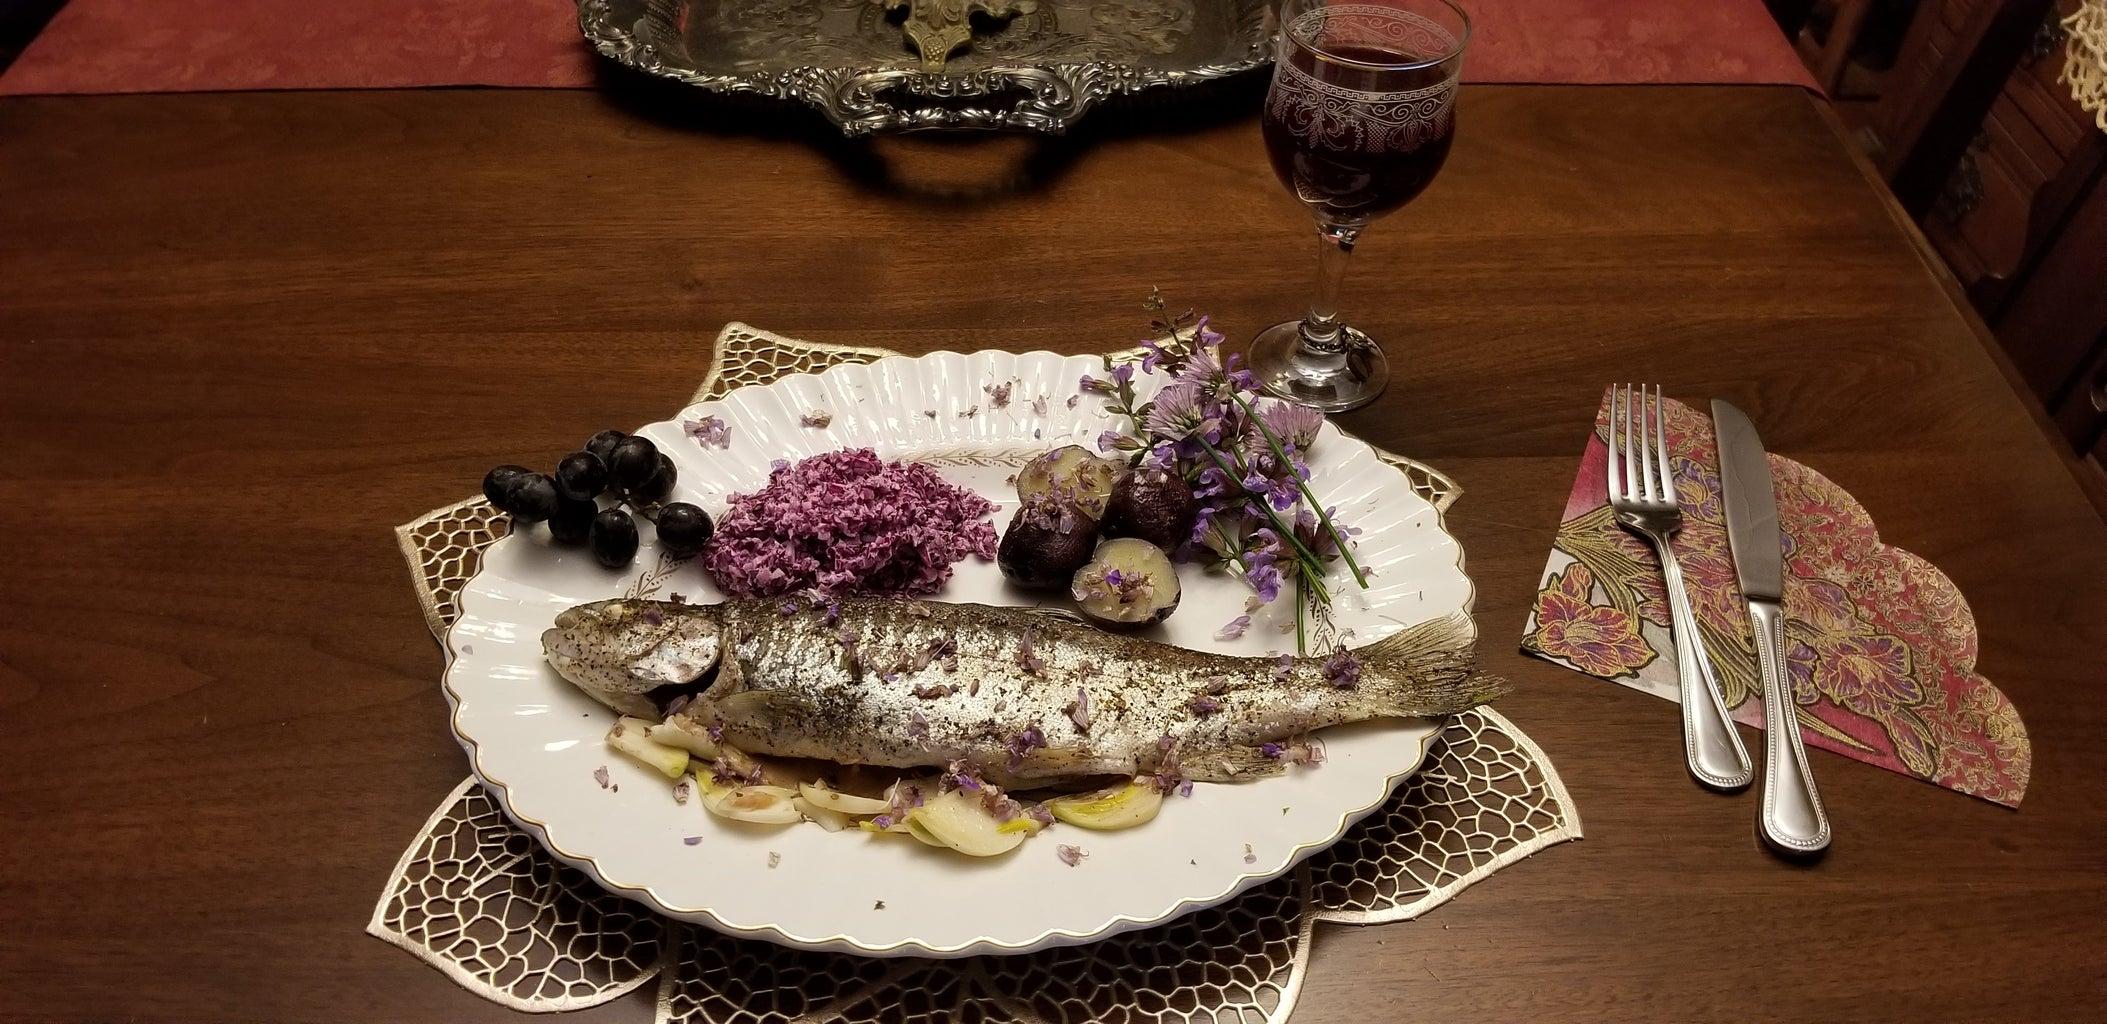 Rainbow Trout / a Celebration of Violet